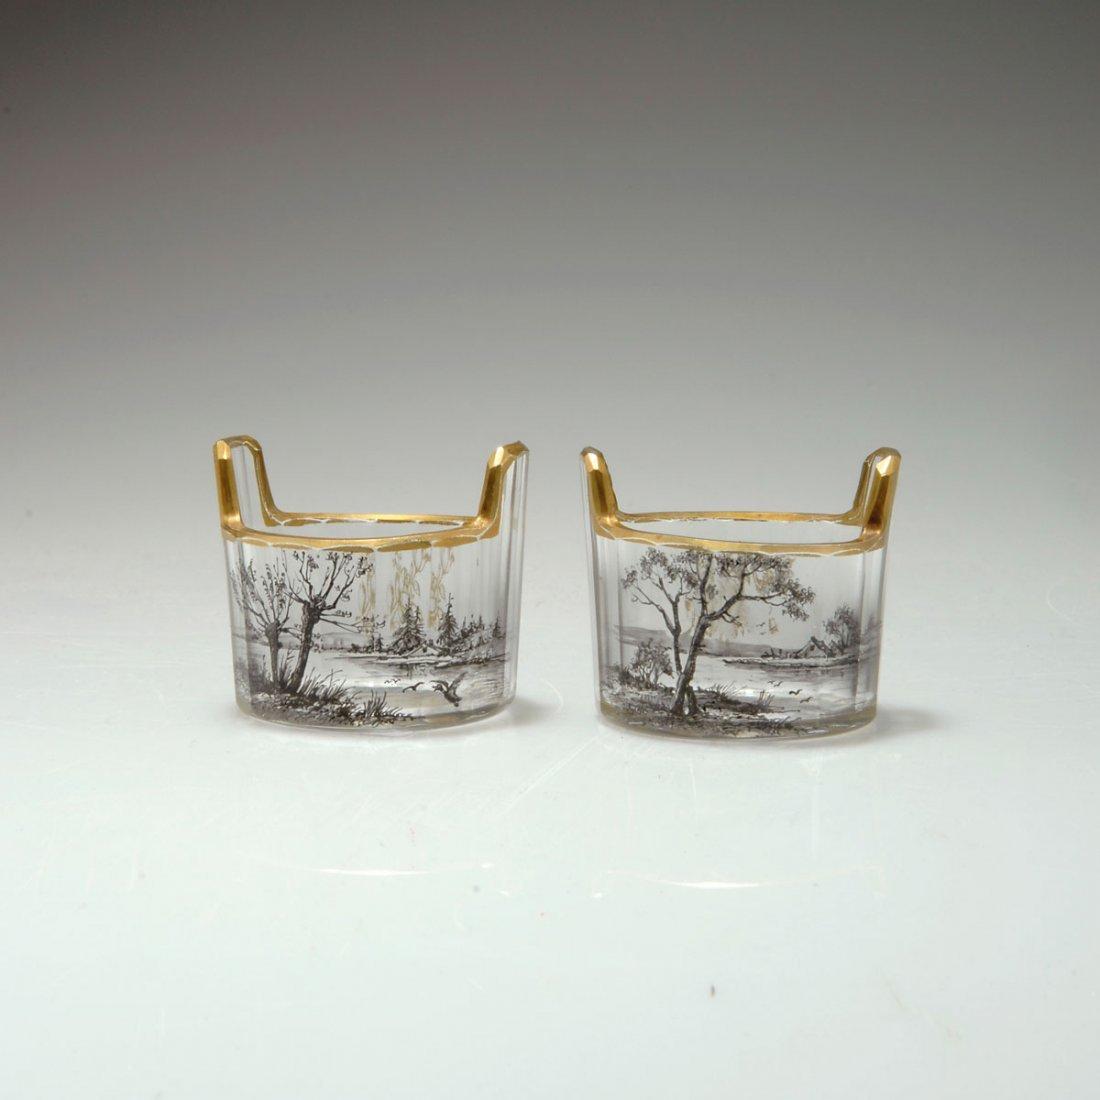 22: Paar Salzfässchen, um 1892